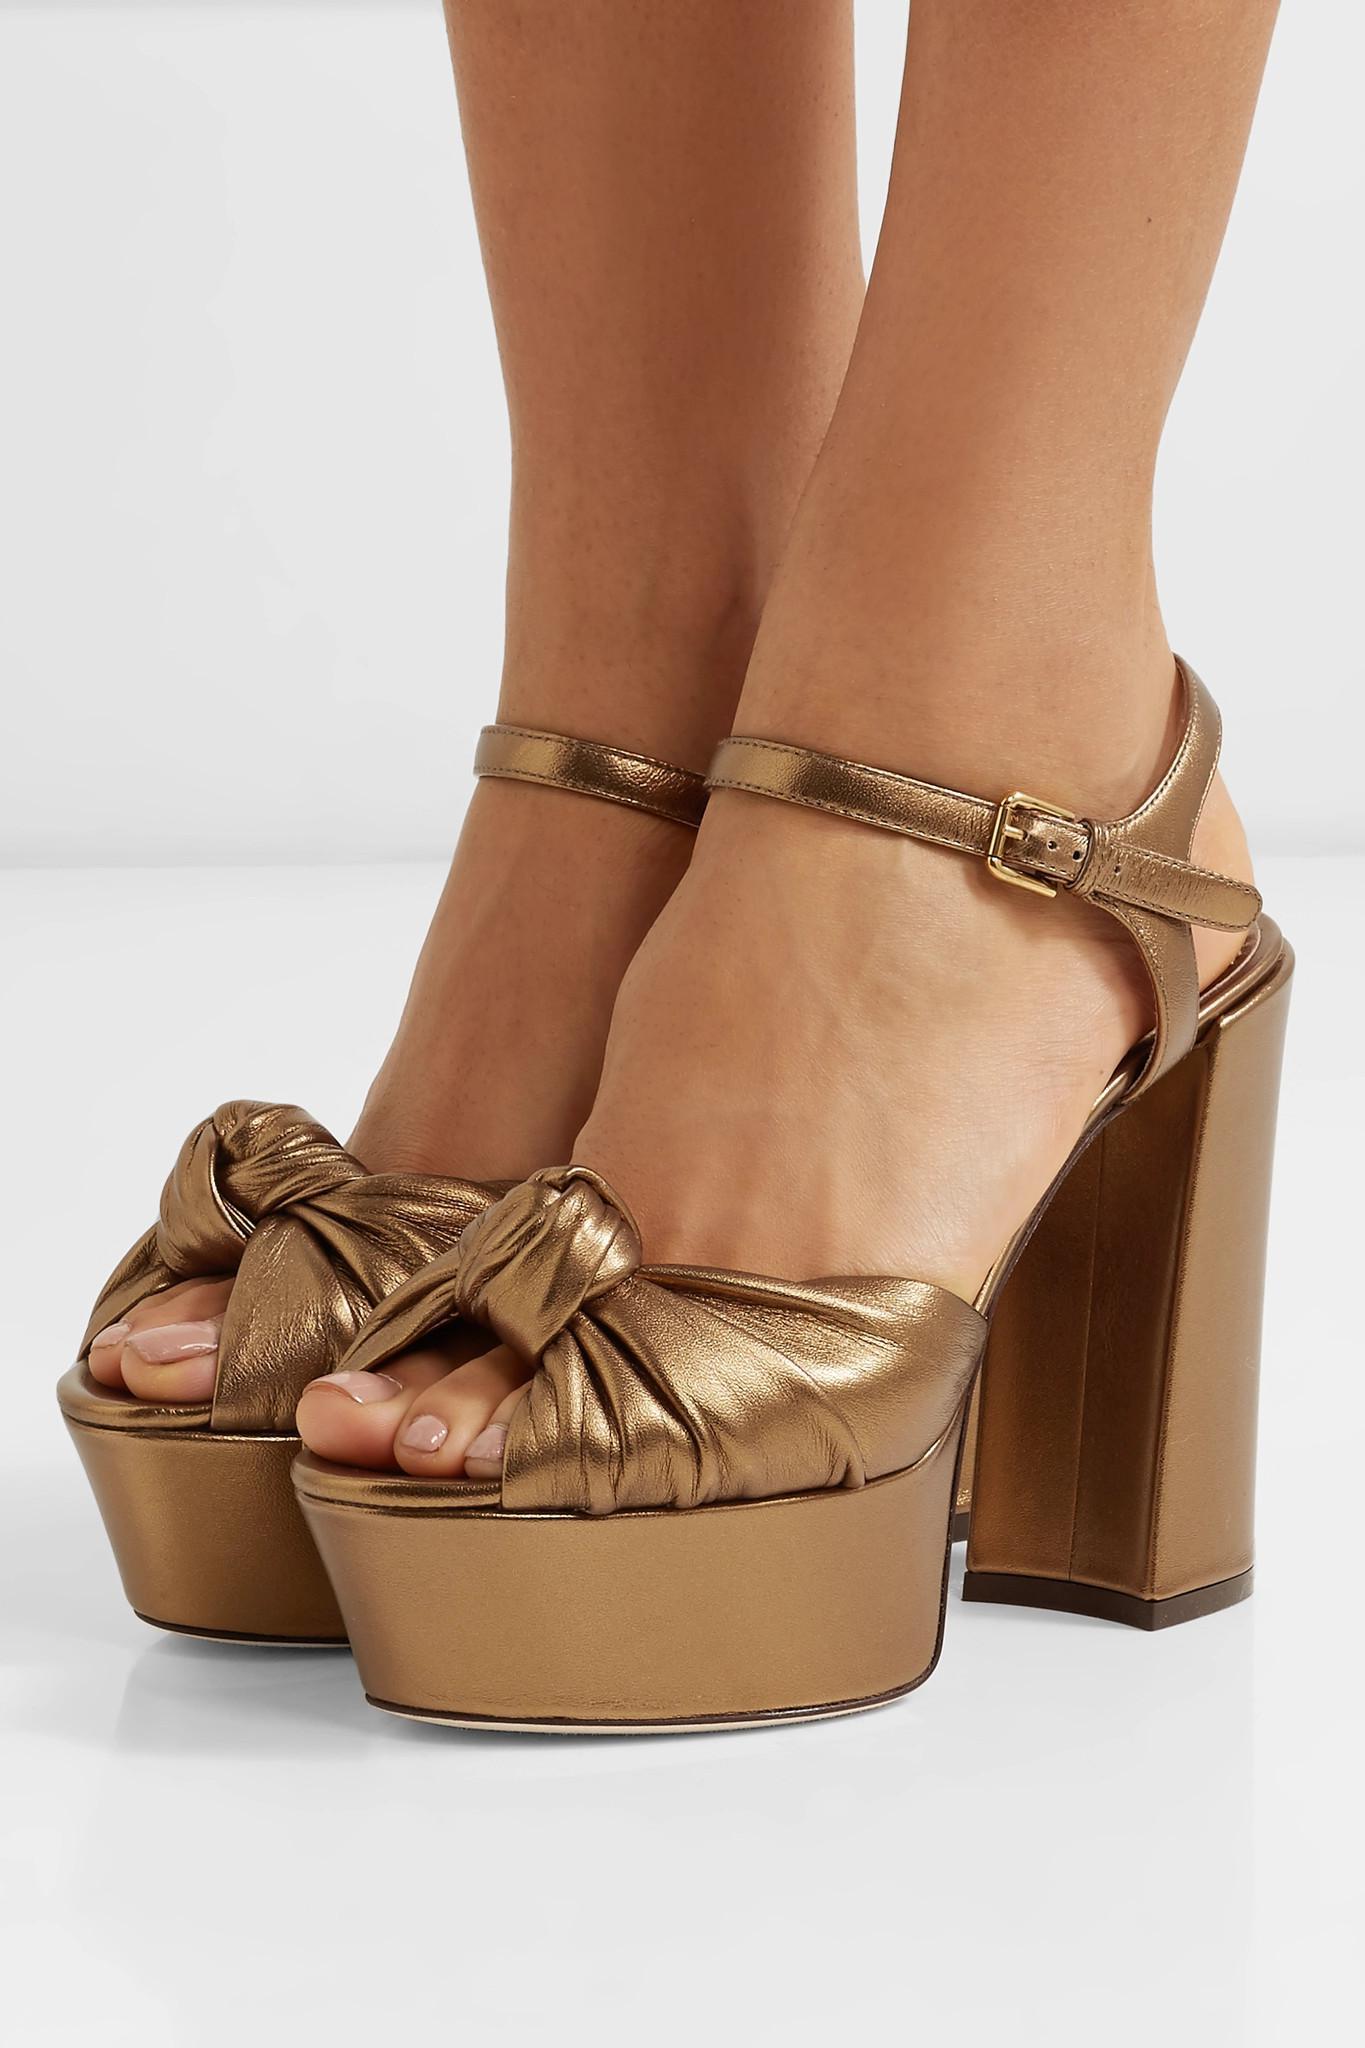 bda5b2349d8 Dolce   Gabbana - Knotted Metallic Leather Platform Sandals - Lyst. View  fullscreen